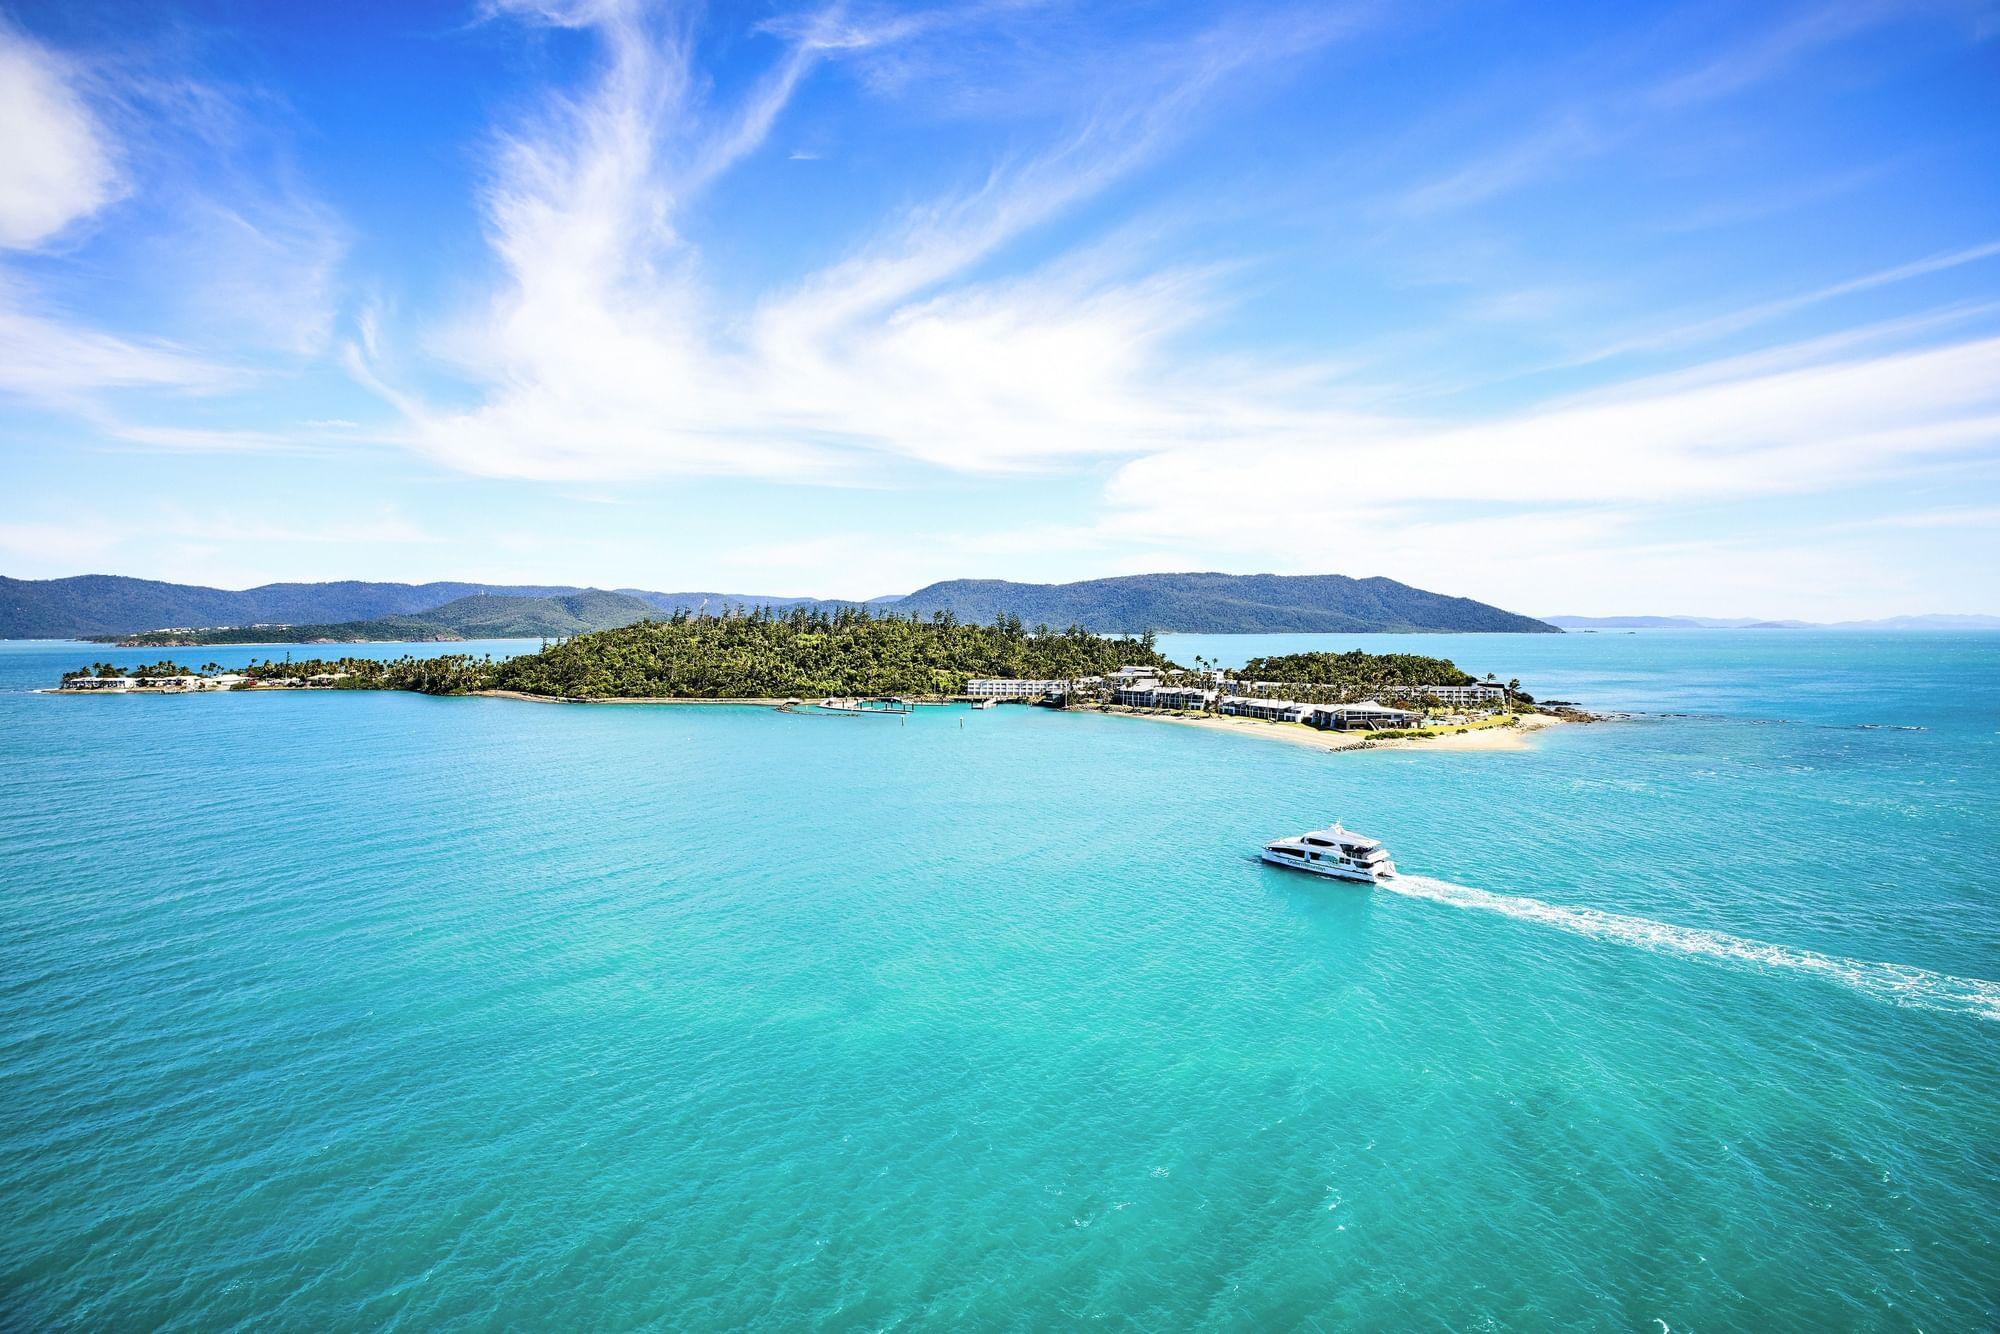 Aerial view of ocean near Daydream Island Resort